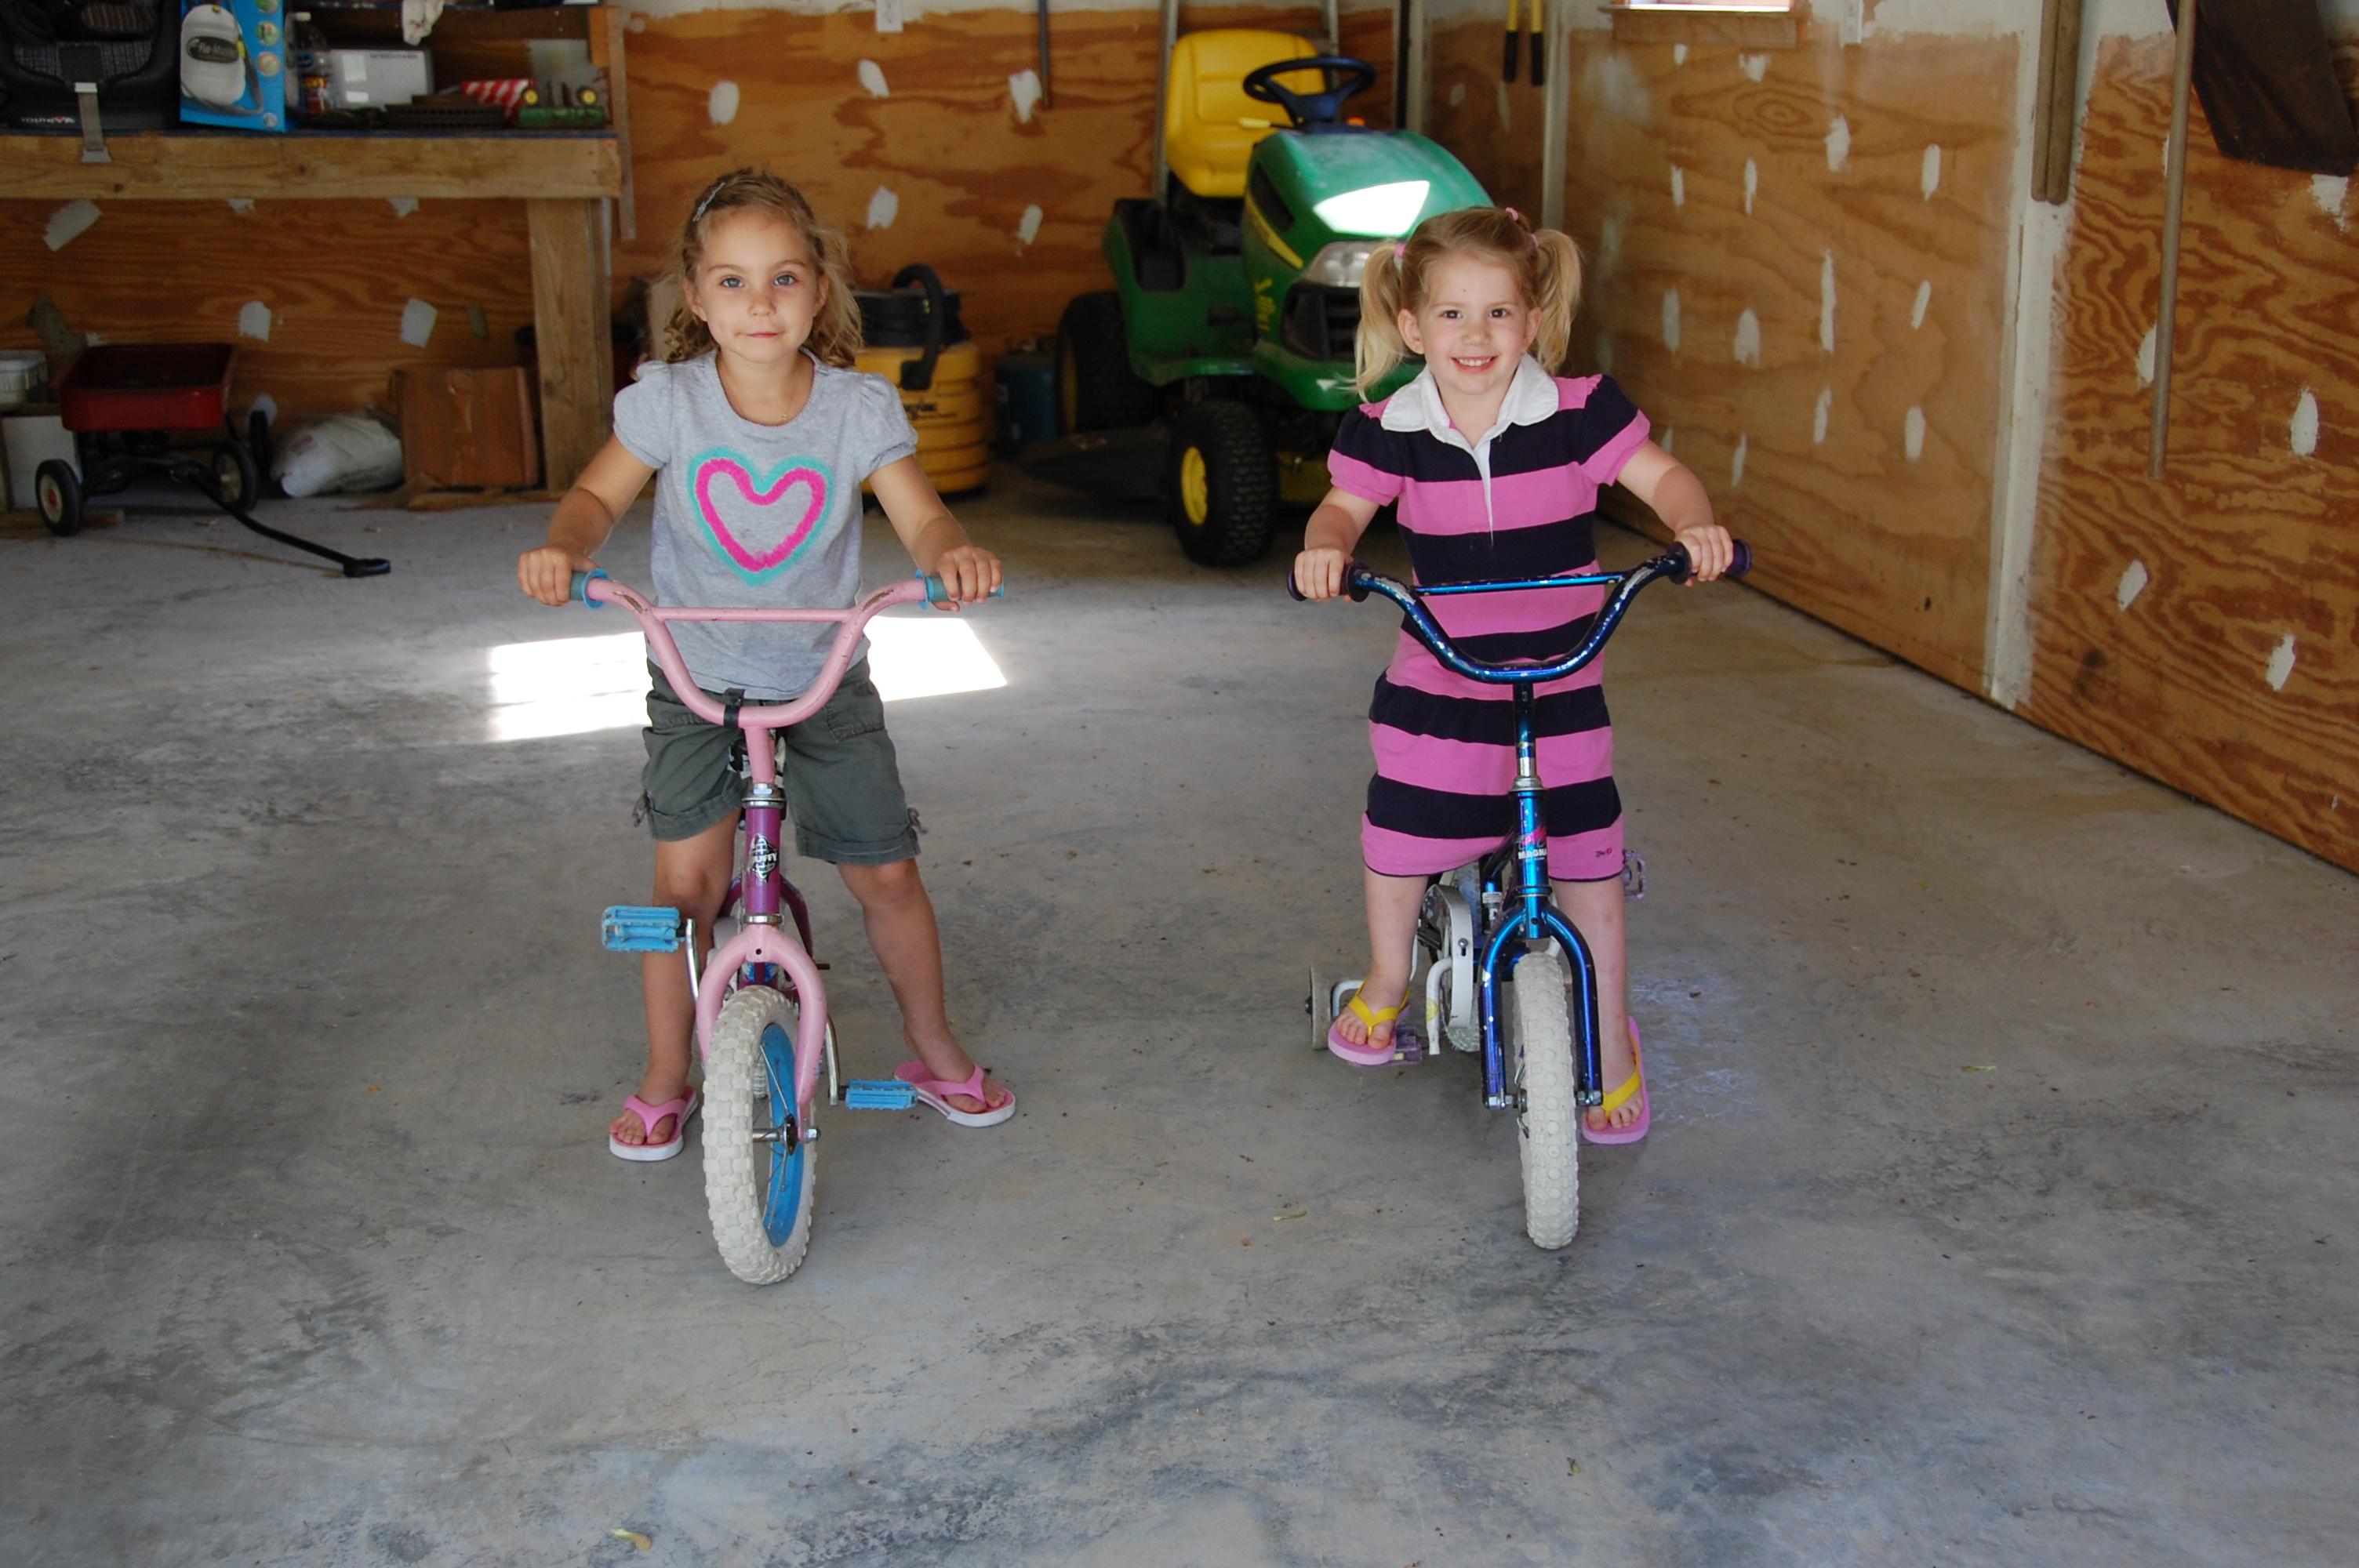 Brynn & Kaylin having fun riding bikes together